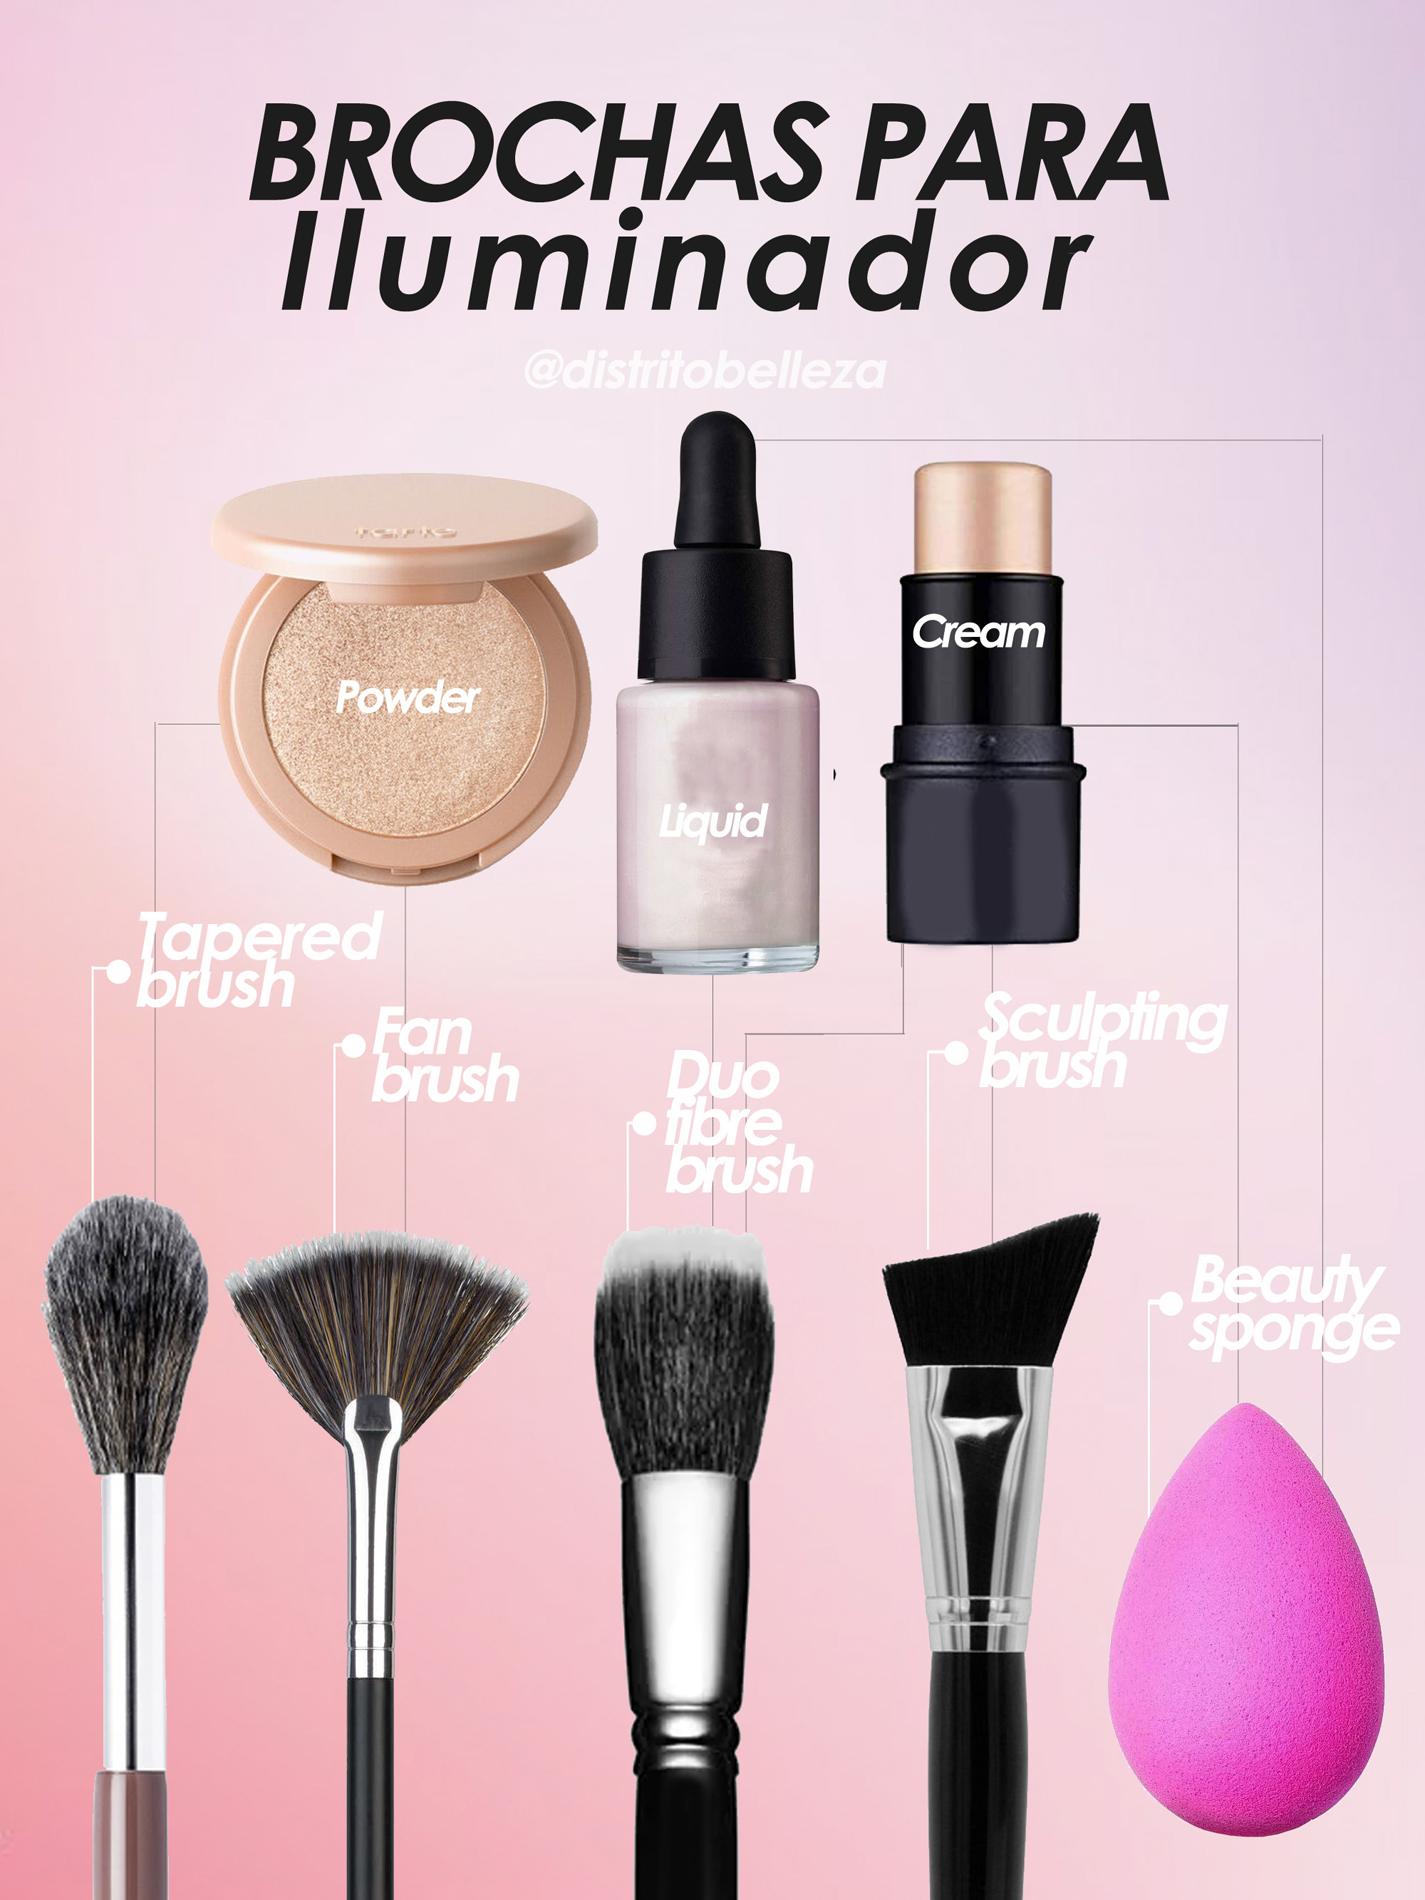 Esponja Paw Paw de Shop MissA Esponja Beauty Blender